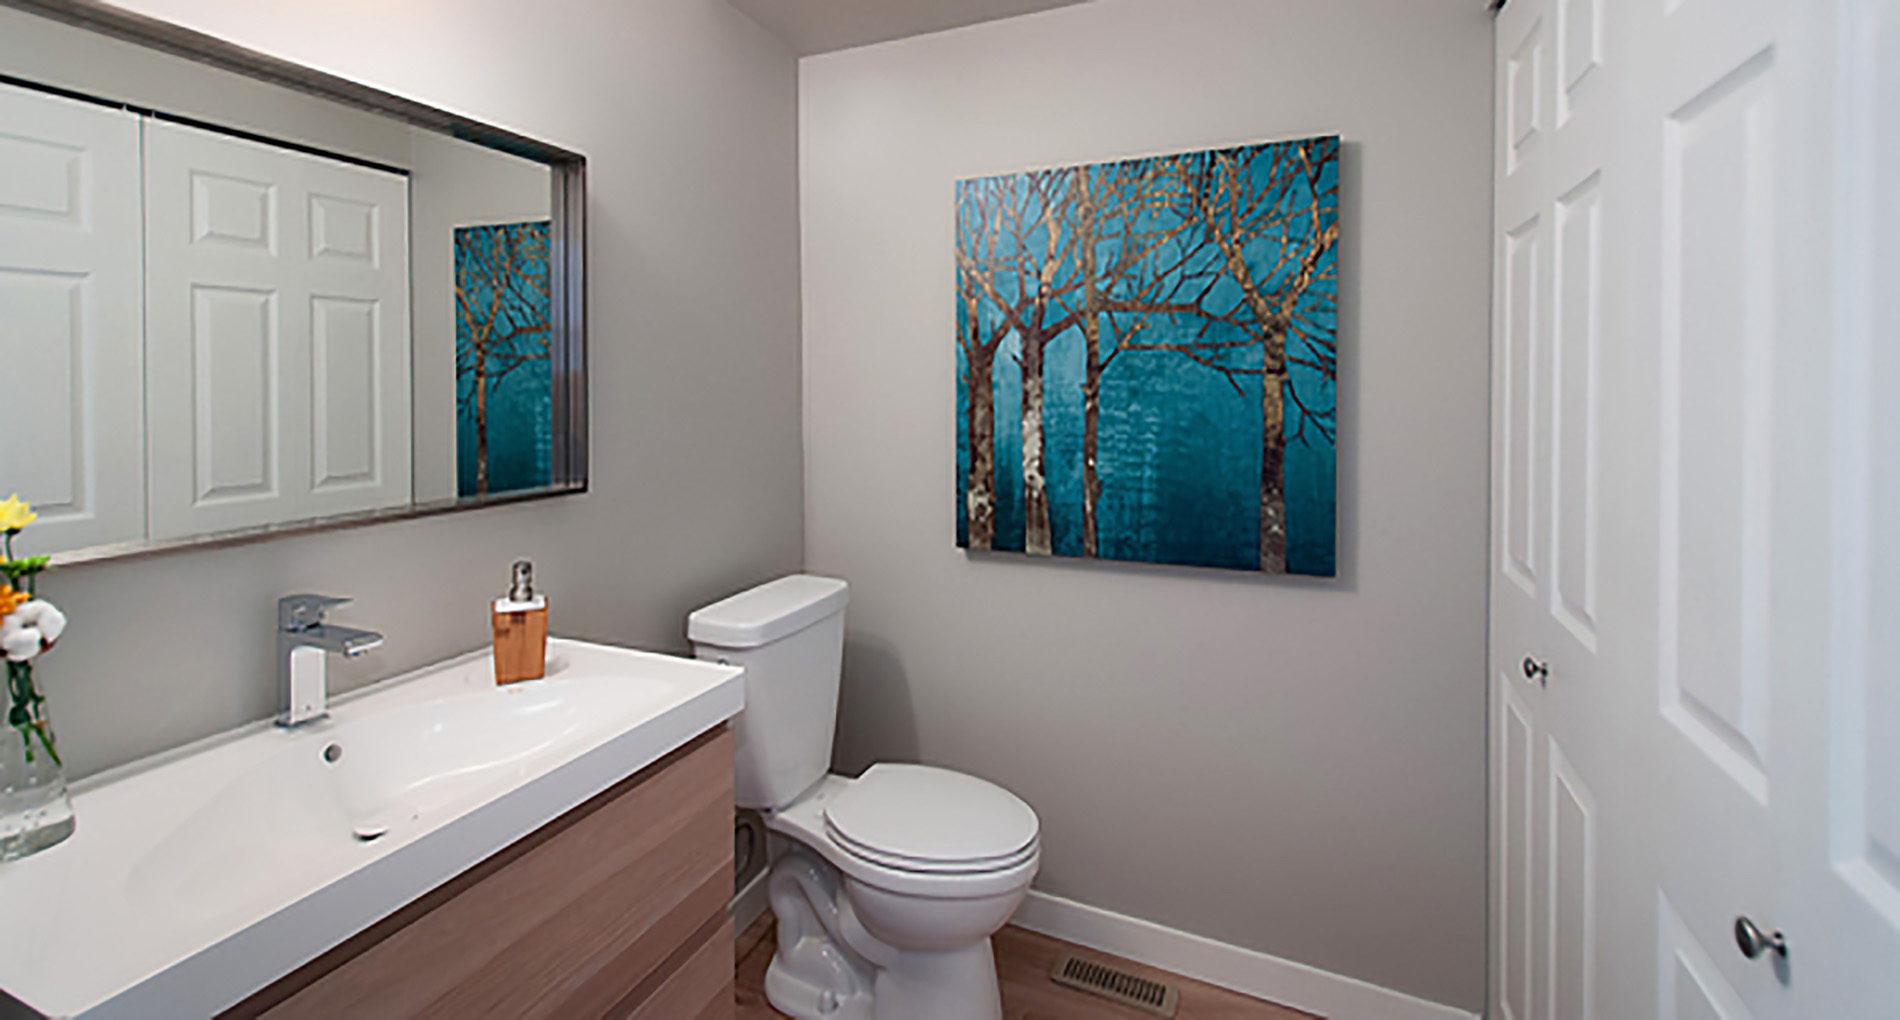 Bathroom Renovation Delta Deltatownhouse Slider